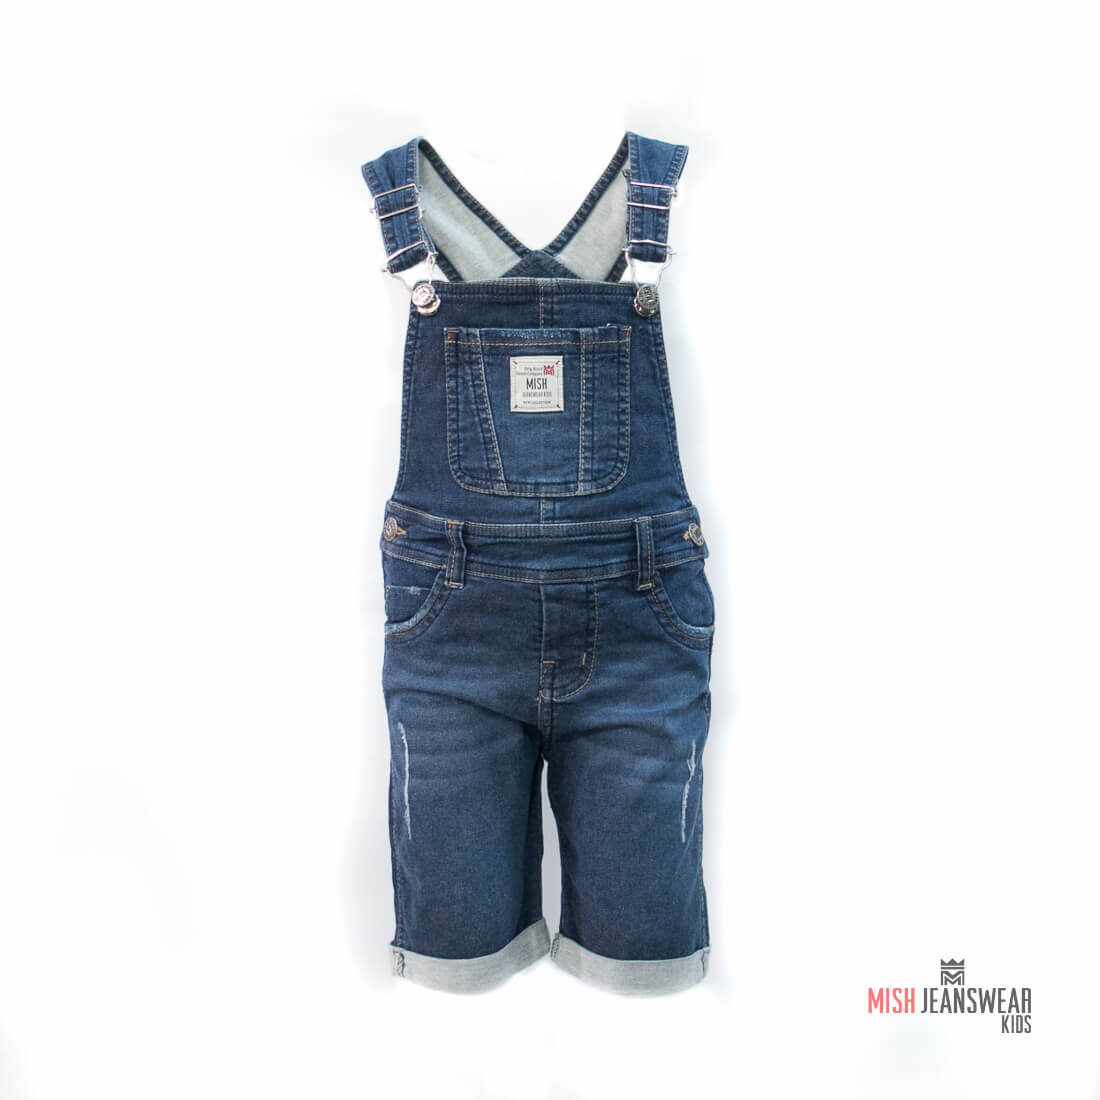 b11f9ceef Jardineira jeans infantil com elastano Mish masculina